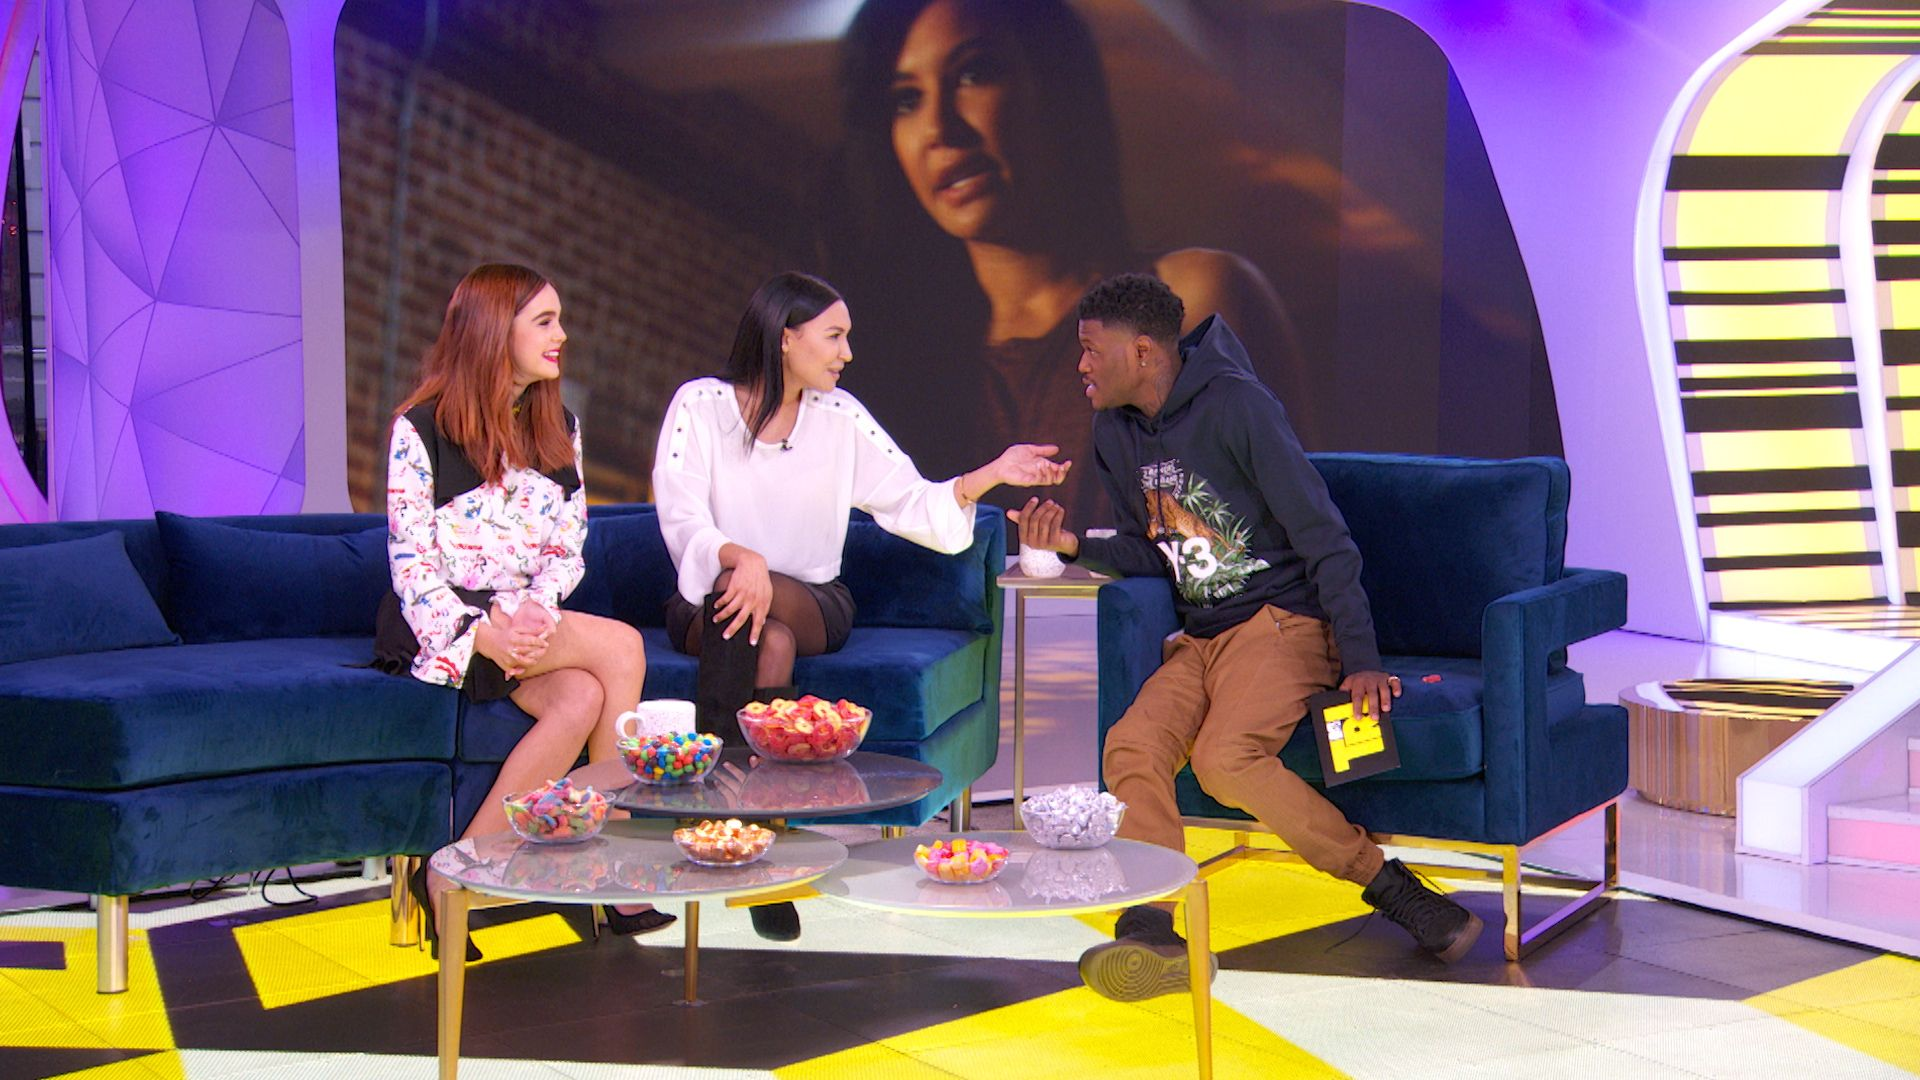 Highlight Bailee Madison And Naya Rivera Talk Embarrassing Texts